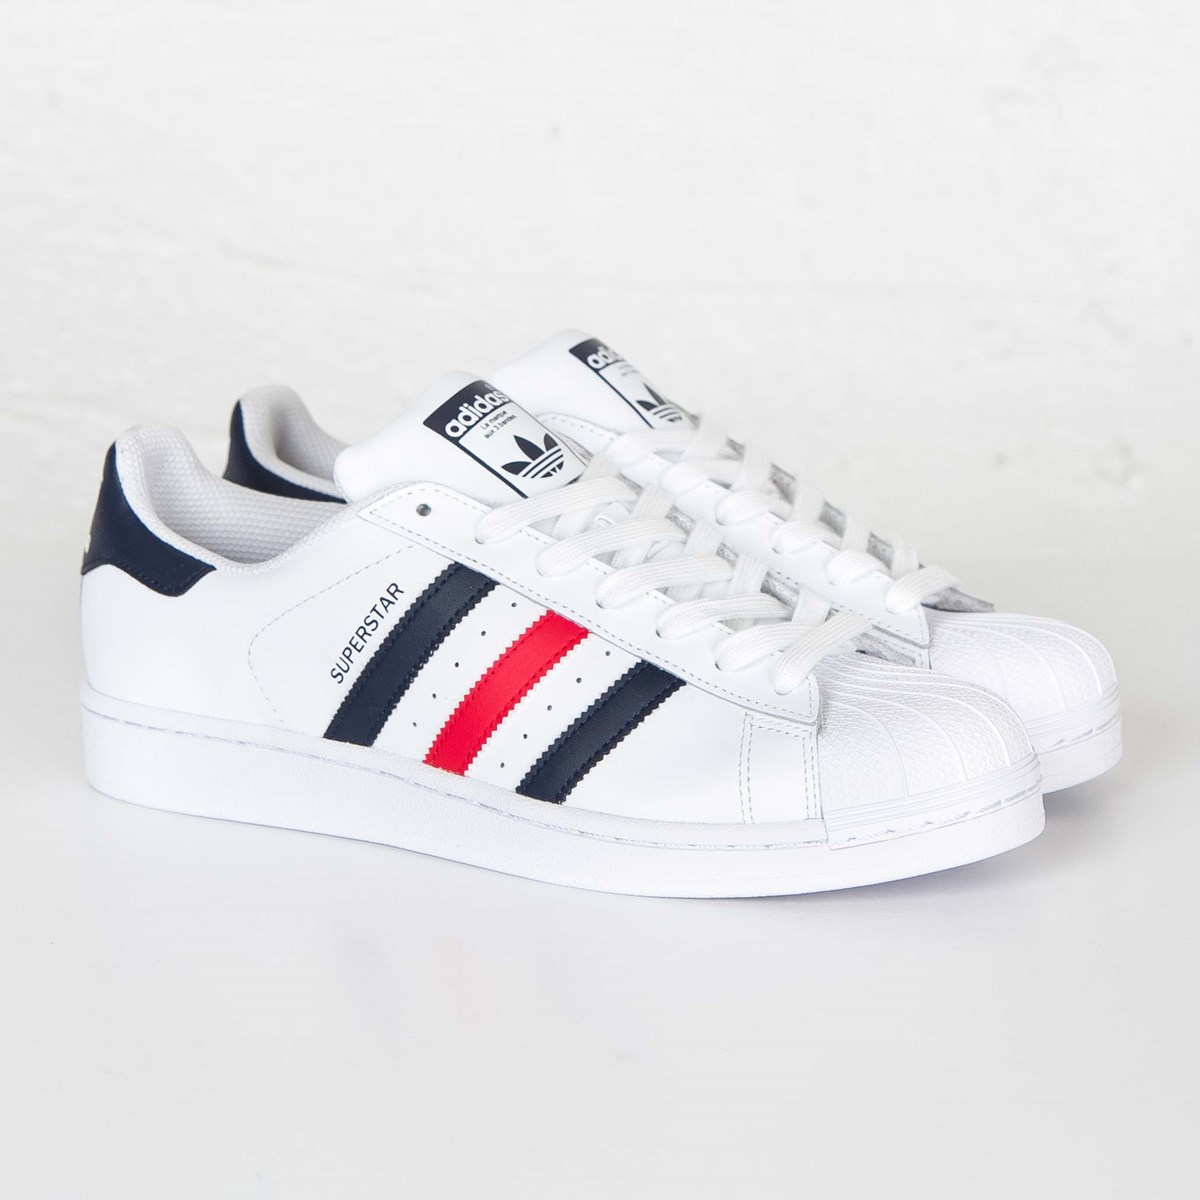 adidas Superstar Foundation - S79208 - Sneakersnstuff   sneakers